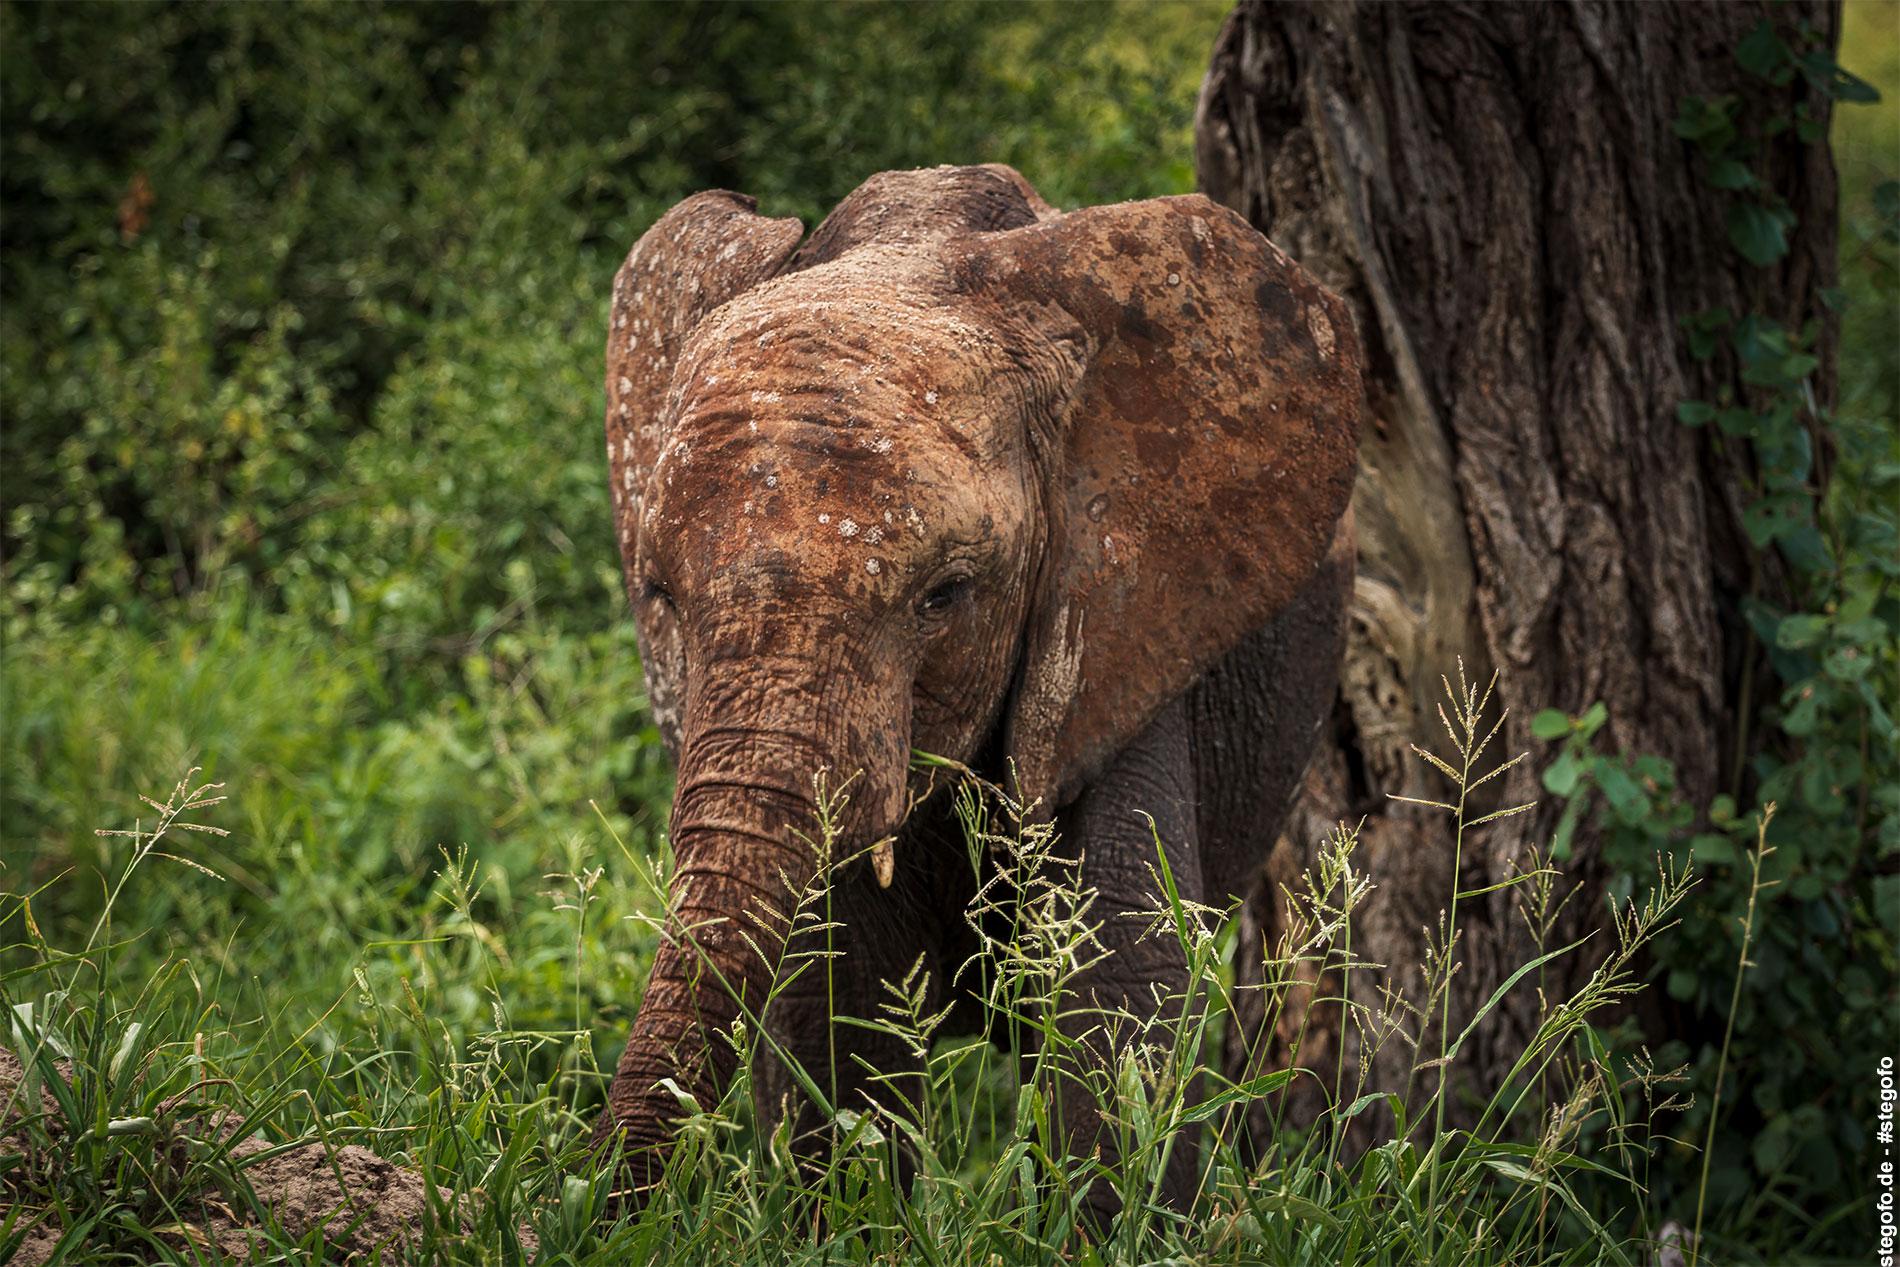 Der verträumte Elefant